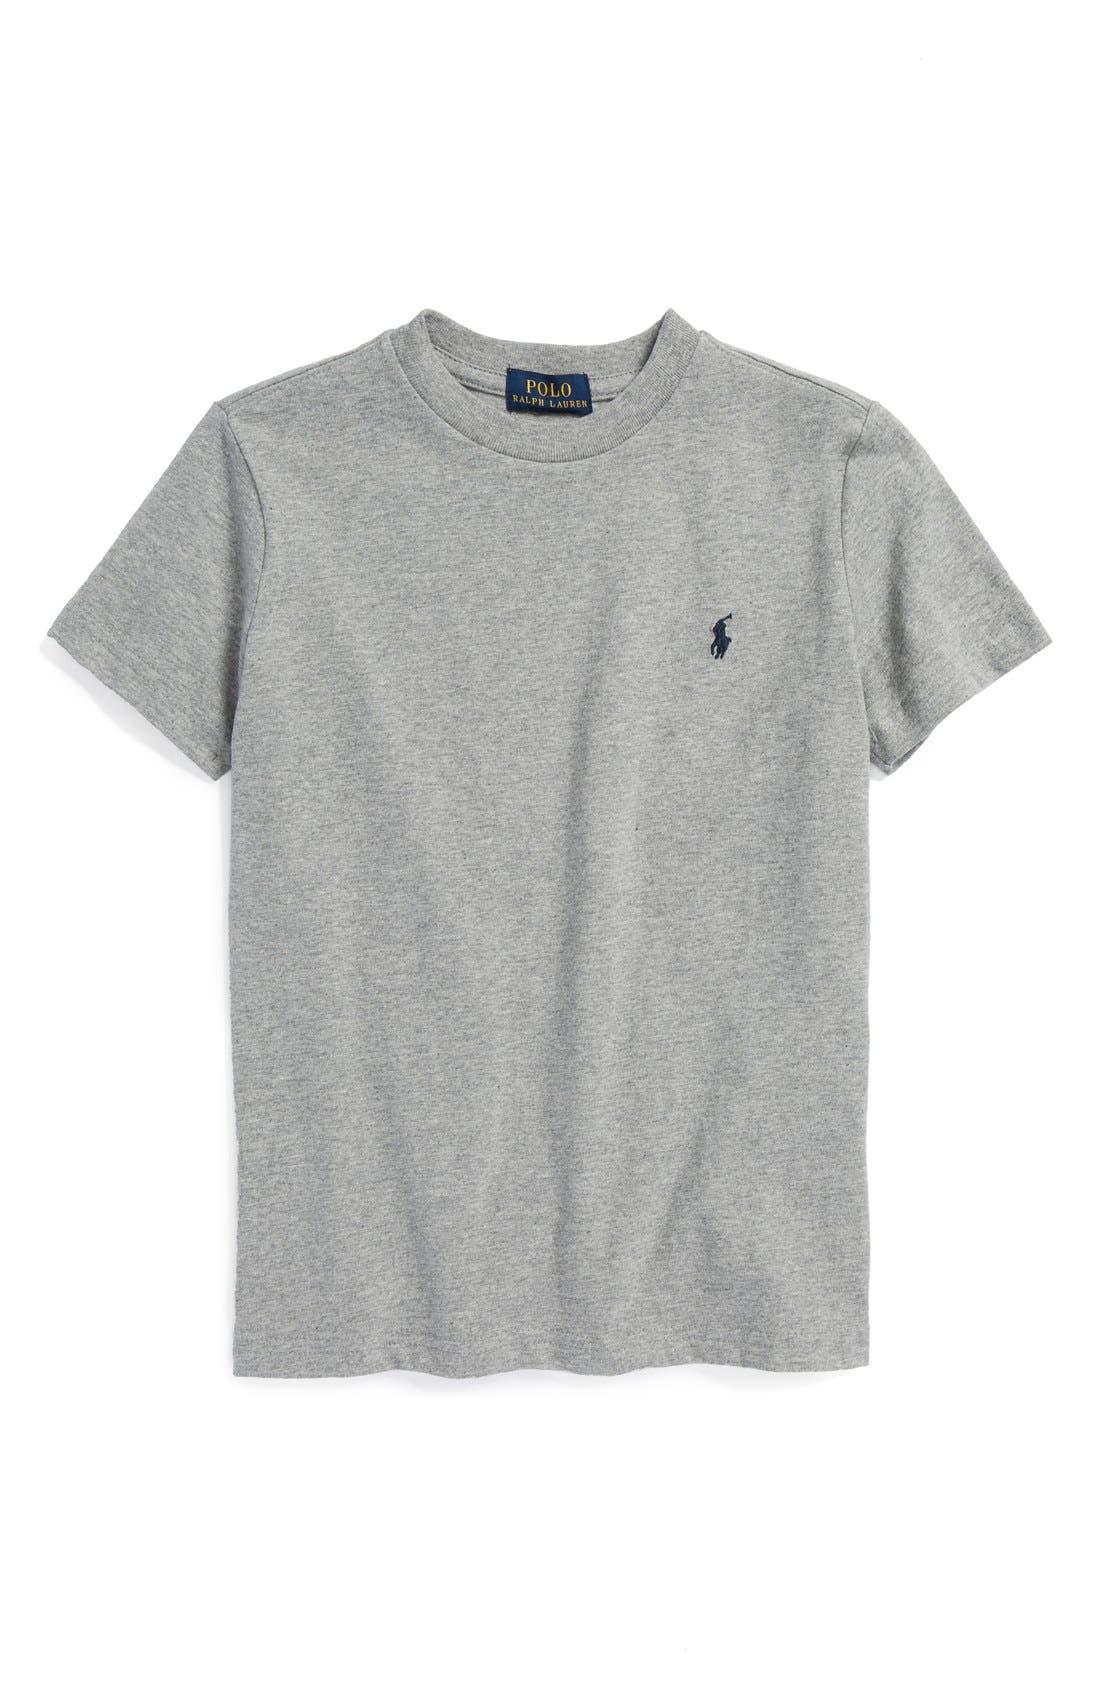 Alternate Image 1 Selected - Ralph Lauren Cotton Crewneck T-Shirt (Big Boys)